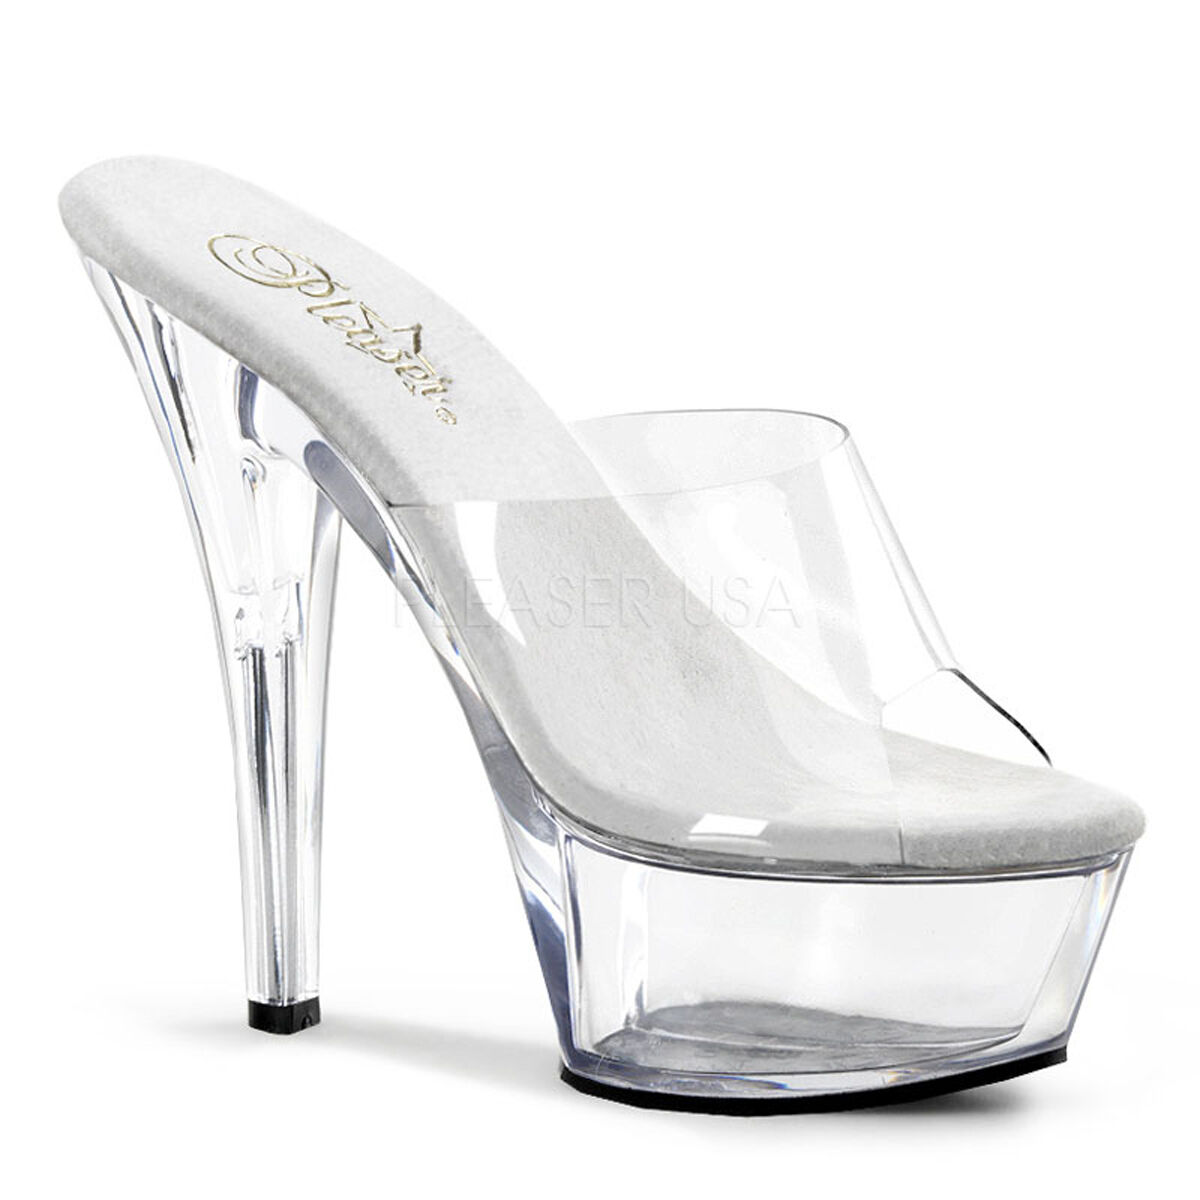 Pleaser Kiss-201 Ladies Clear Stiletto Stiletto Stiletto Heel Platform Slide Pole Dance shoes 974017